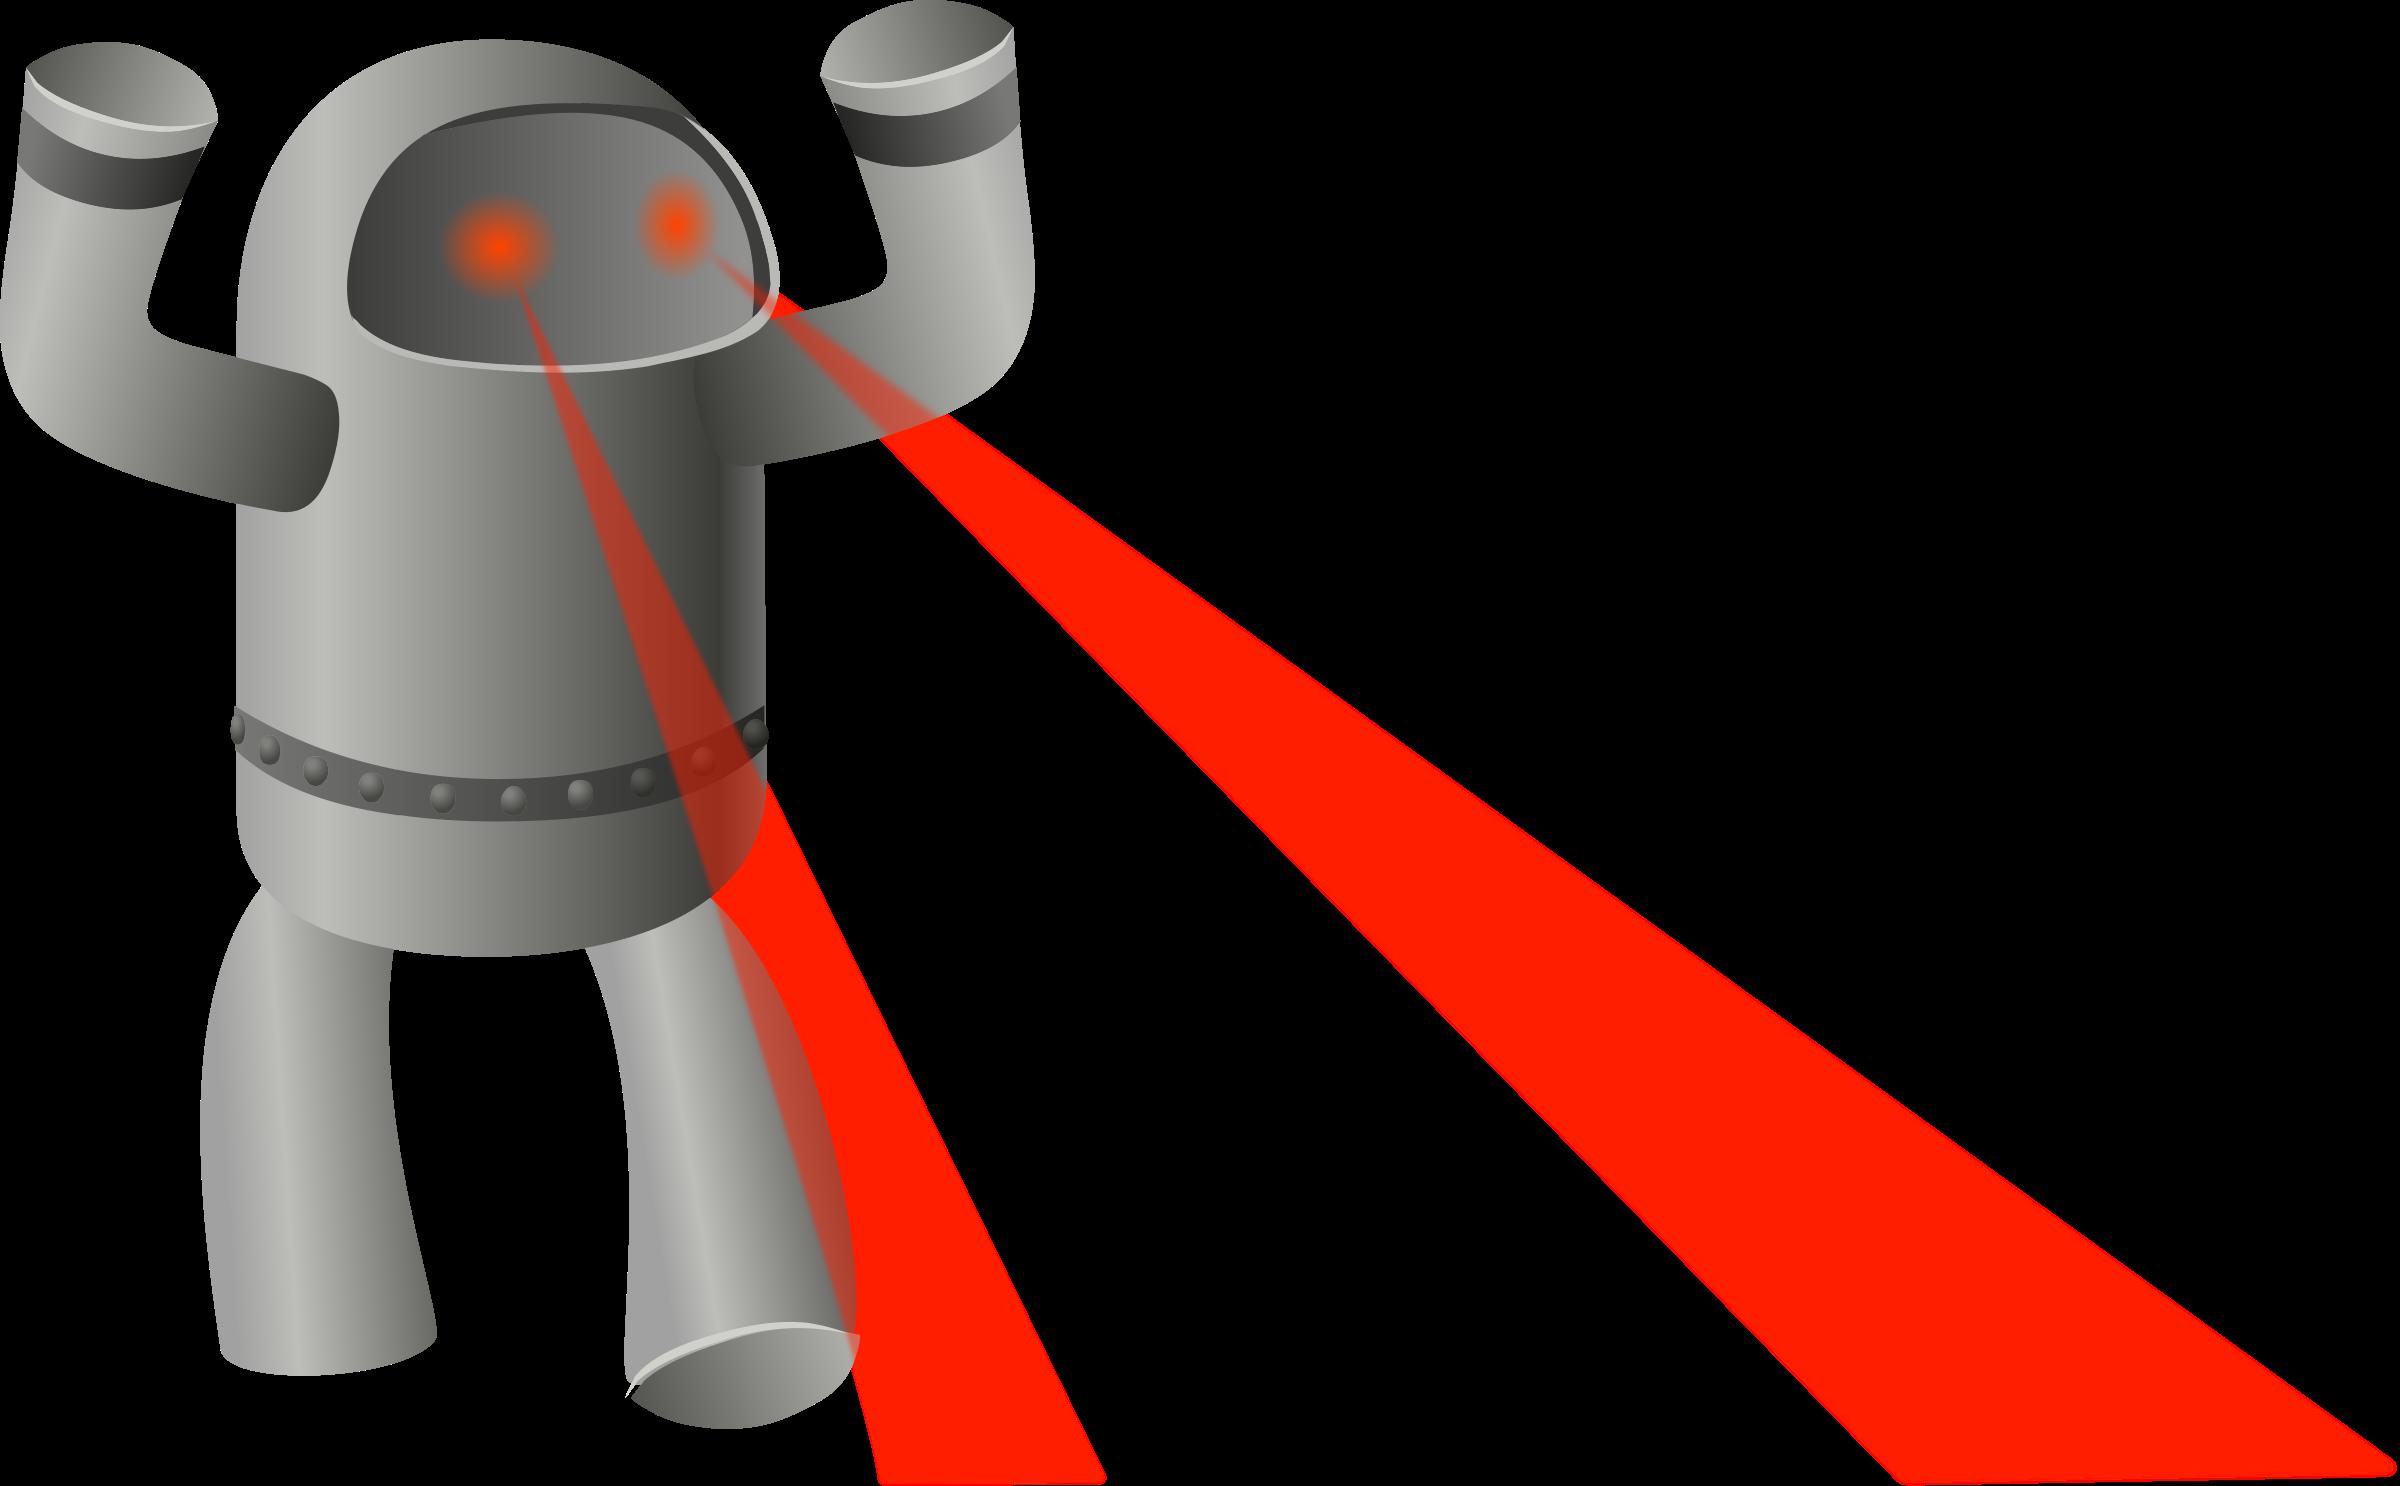 evil-robot-glitch-remix